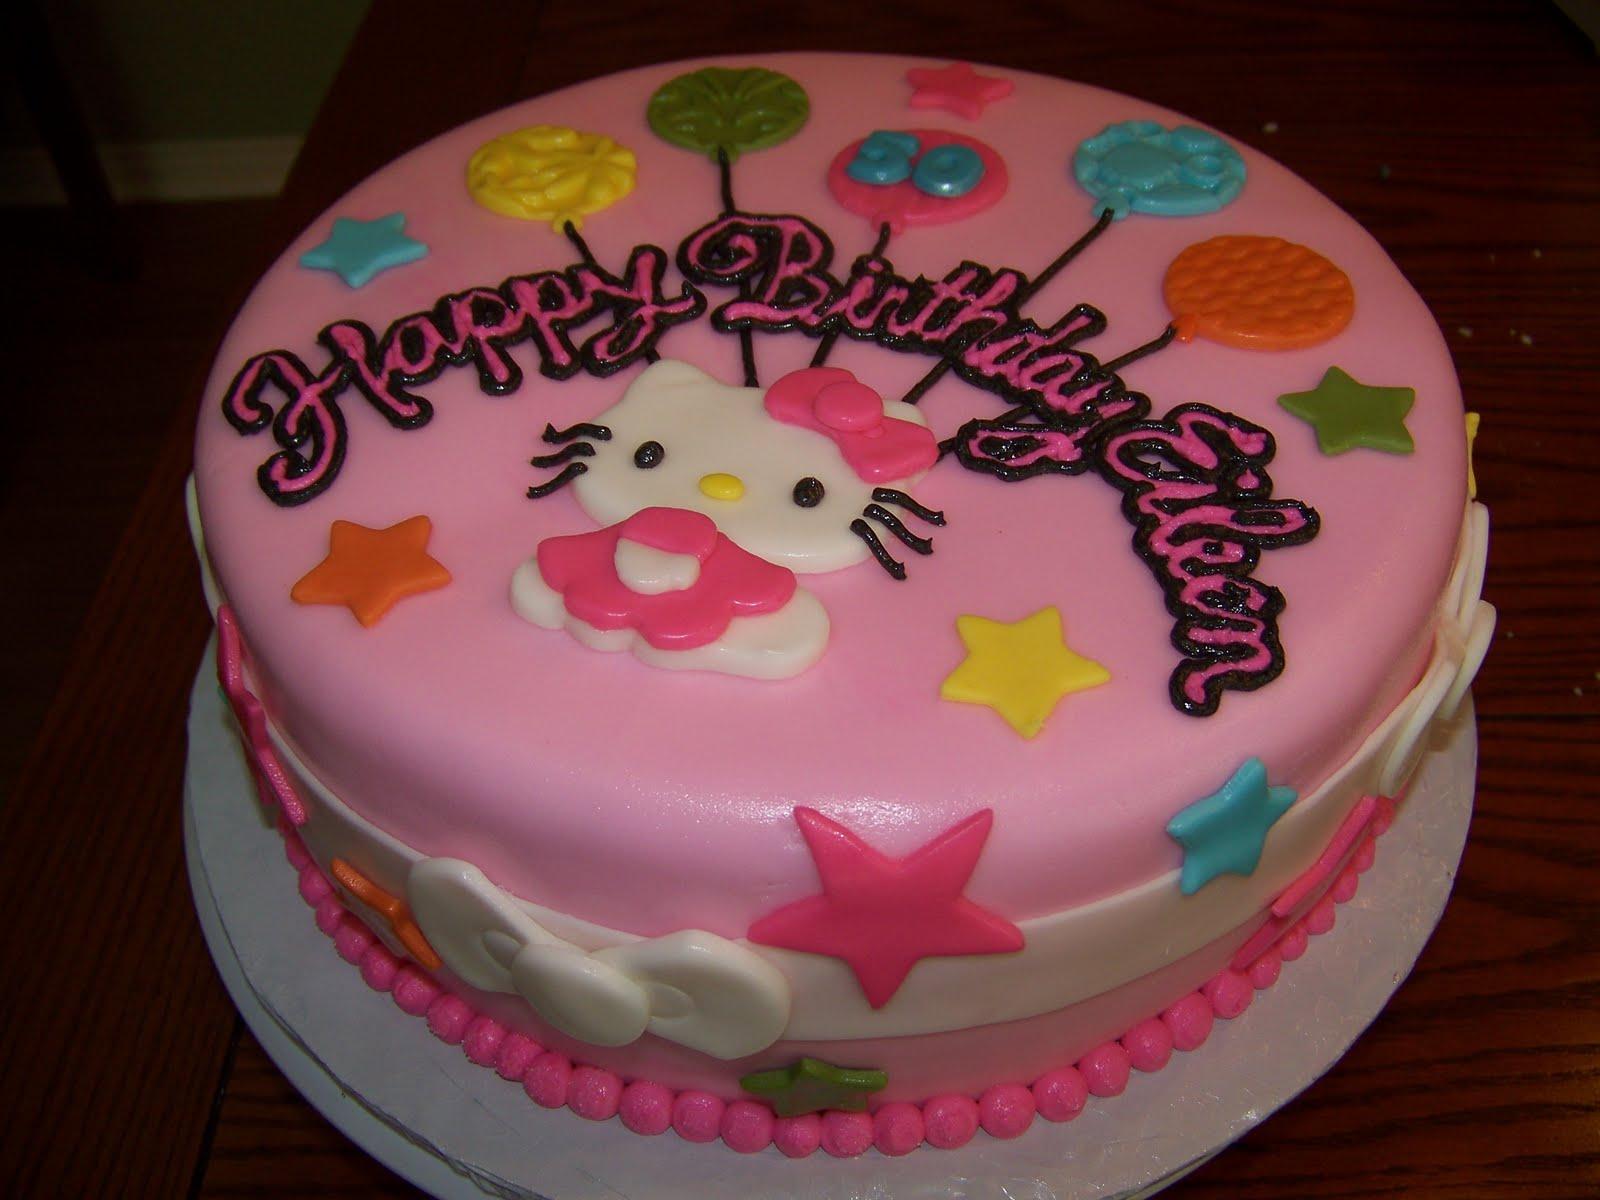 Cake Hello Kitty Birthday : Plumeria Cake Studio: Hello Kitty Birthday Cake